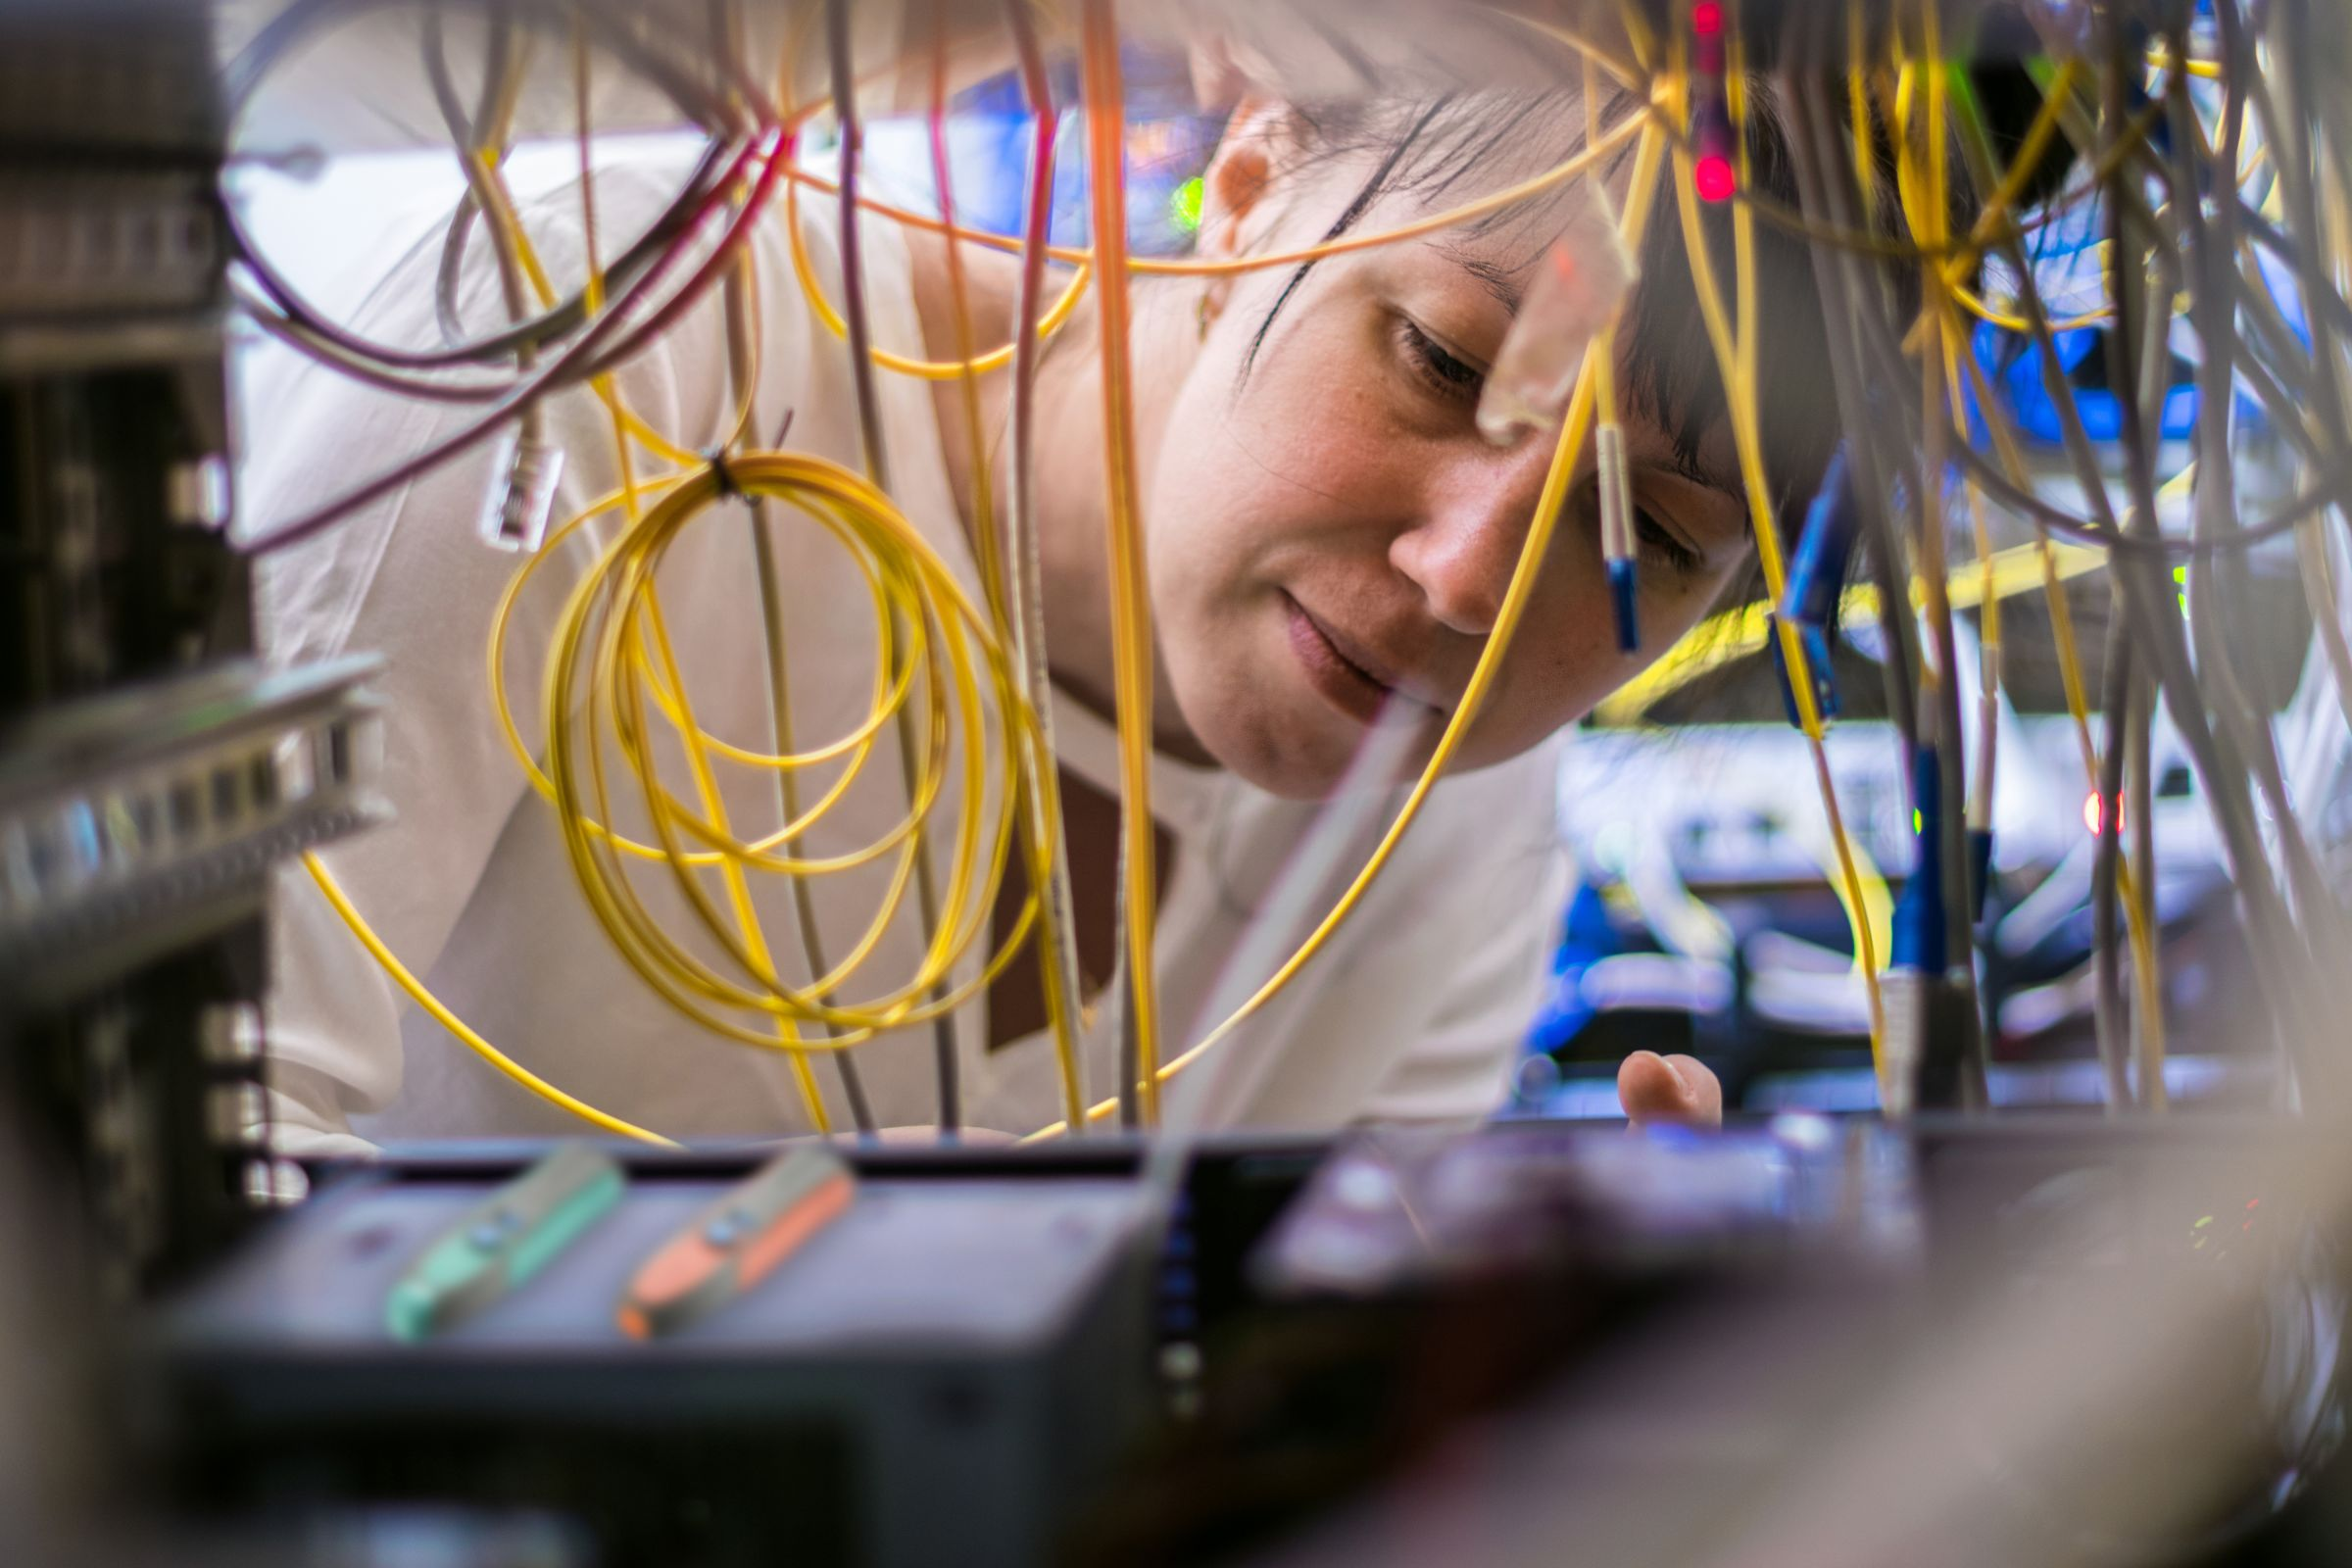 This category includes BERT test, Fiber optics testing hub and Optical testing tool.